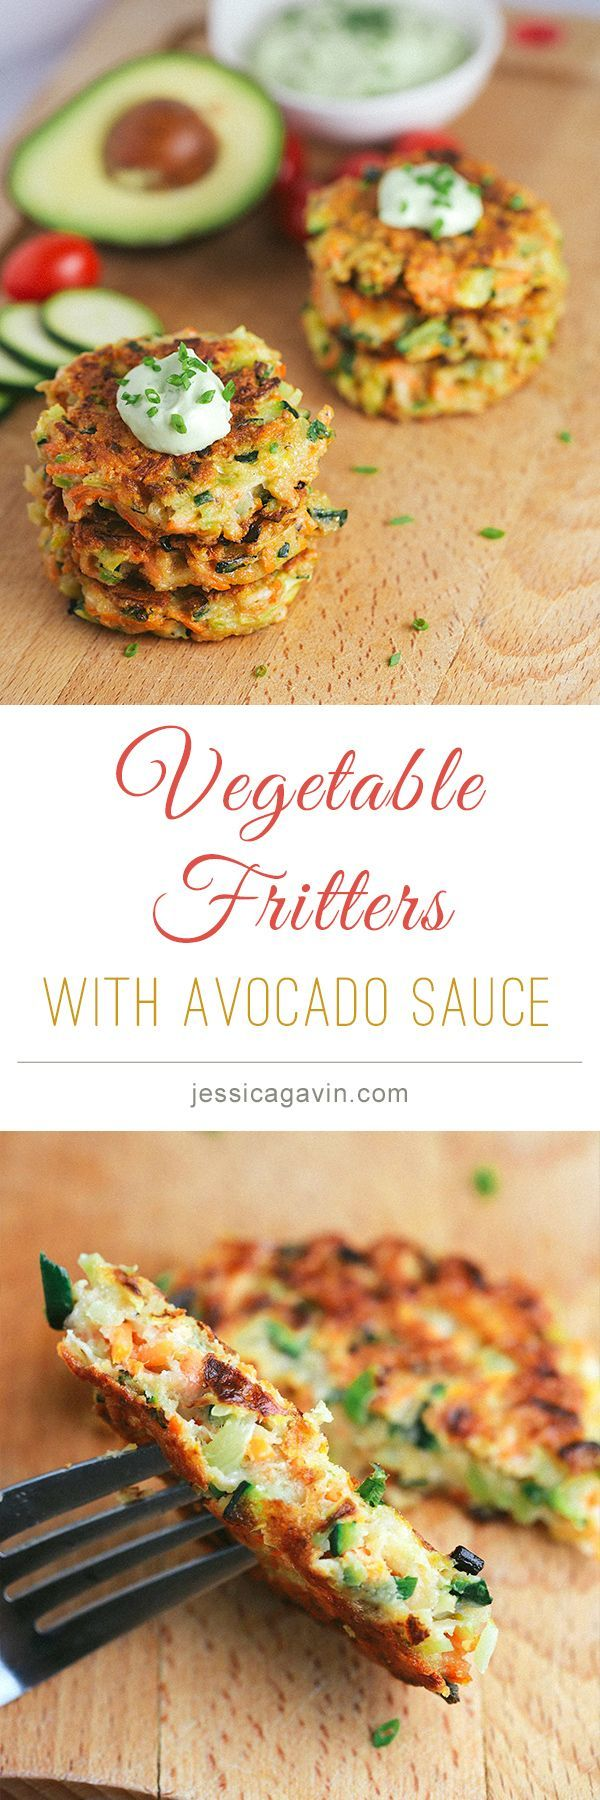 crispy vegetable fritters with avocado yogurt dipping sauce | jessicagavin.com